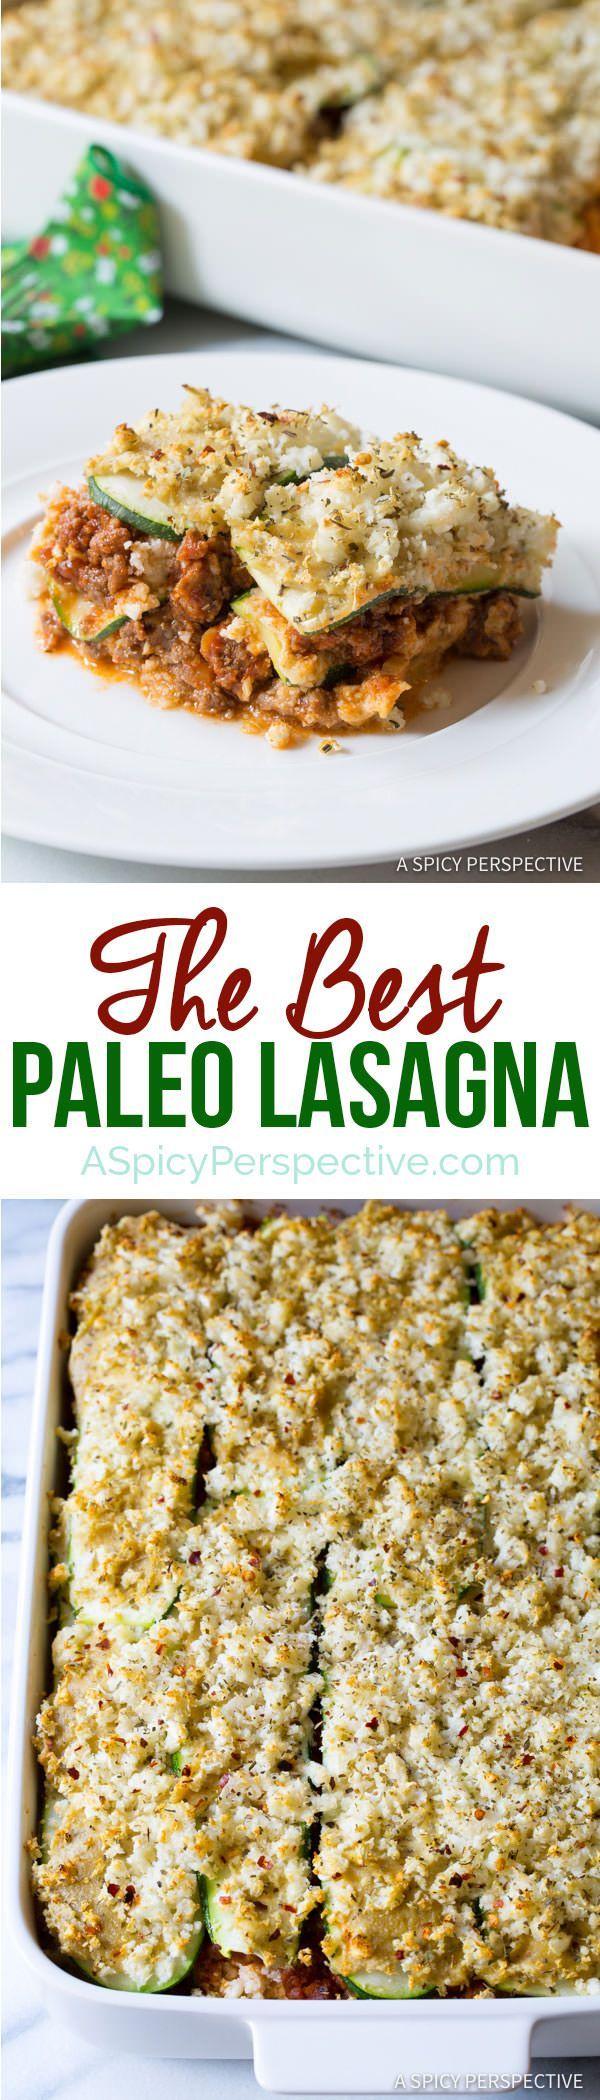 The Best Paleo Lasagna Recipe   http://ASpicyPerspective.com